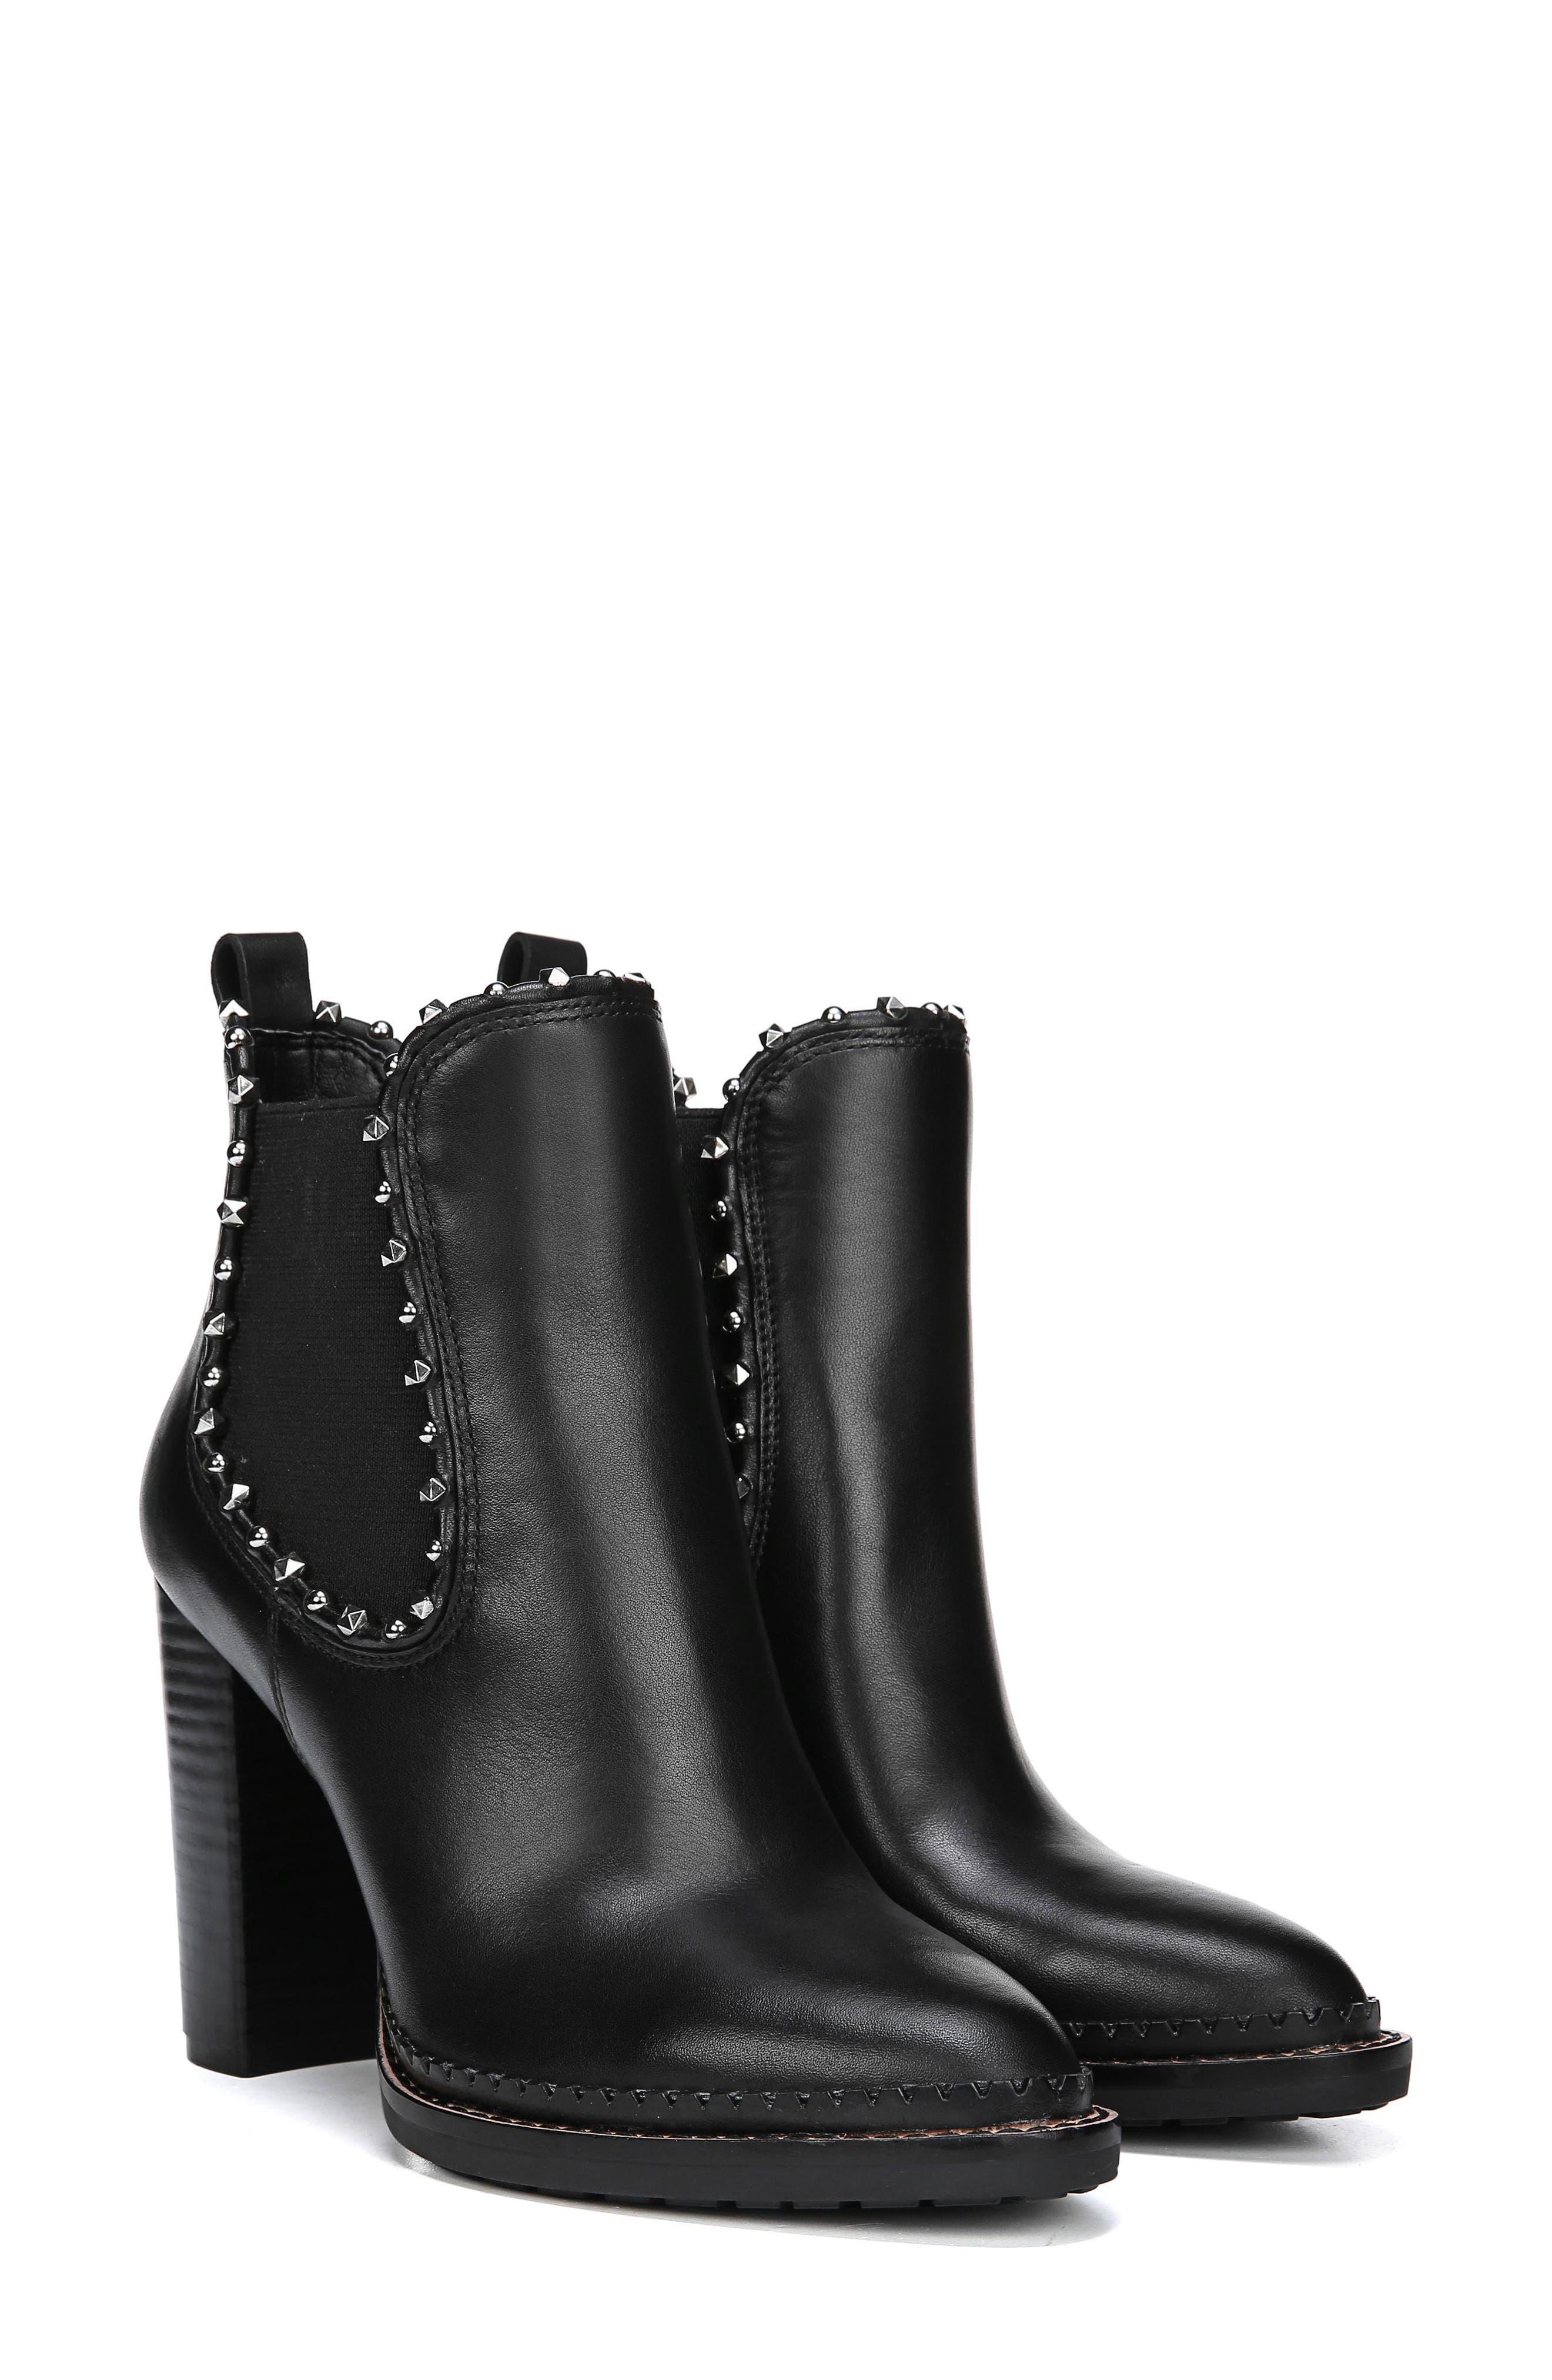 SAM EDELMAN,                             Salma Studded Chelsea Boot,                             Alternate thumbnail 8, color,                             001